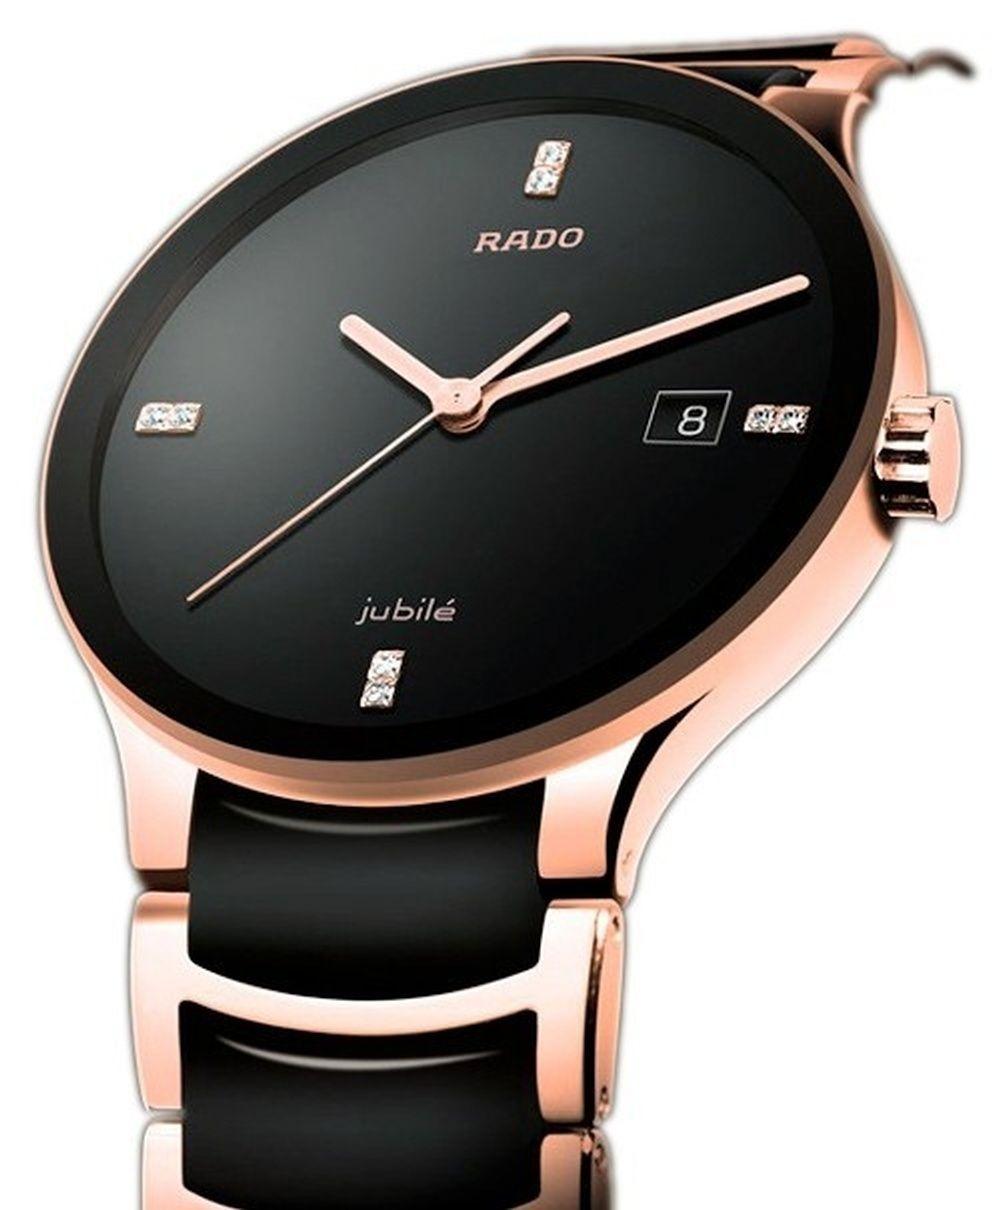 82d4024b165 Rado jubile centrix is a stylish genuine swiss movement stylish  watchSpecification  Model  Rado jubile centrix rose gold Brand  Rado  Gender  Men Strap ...